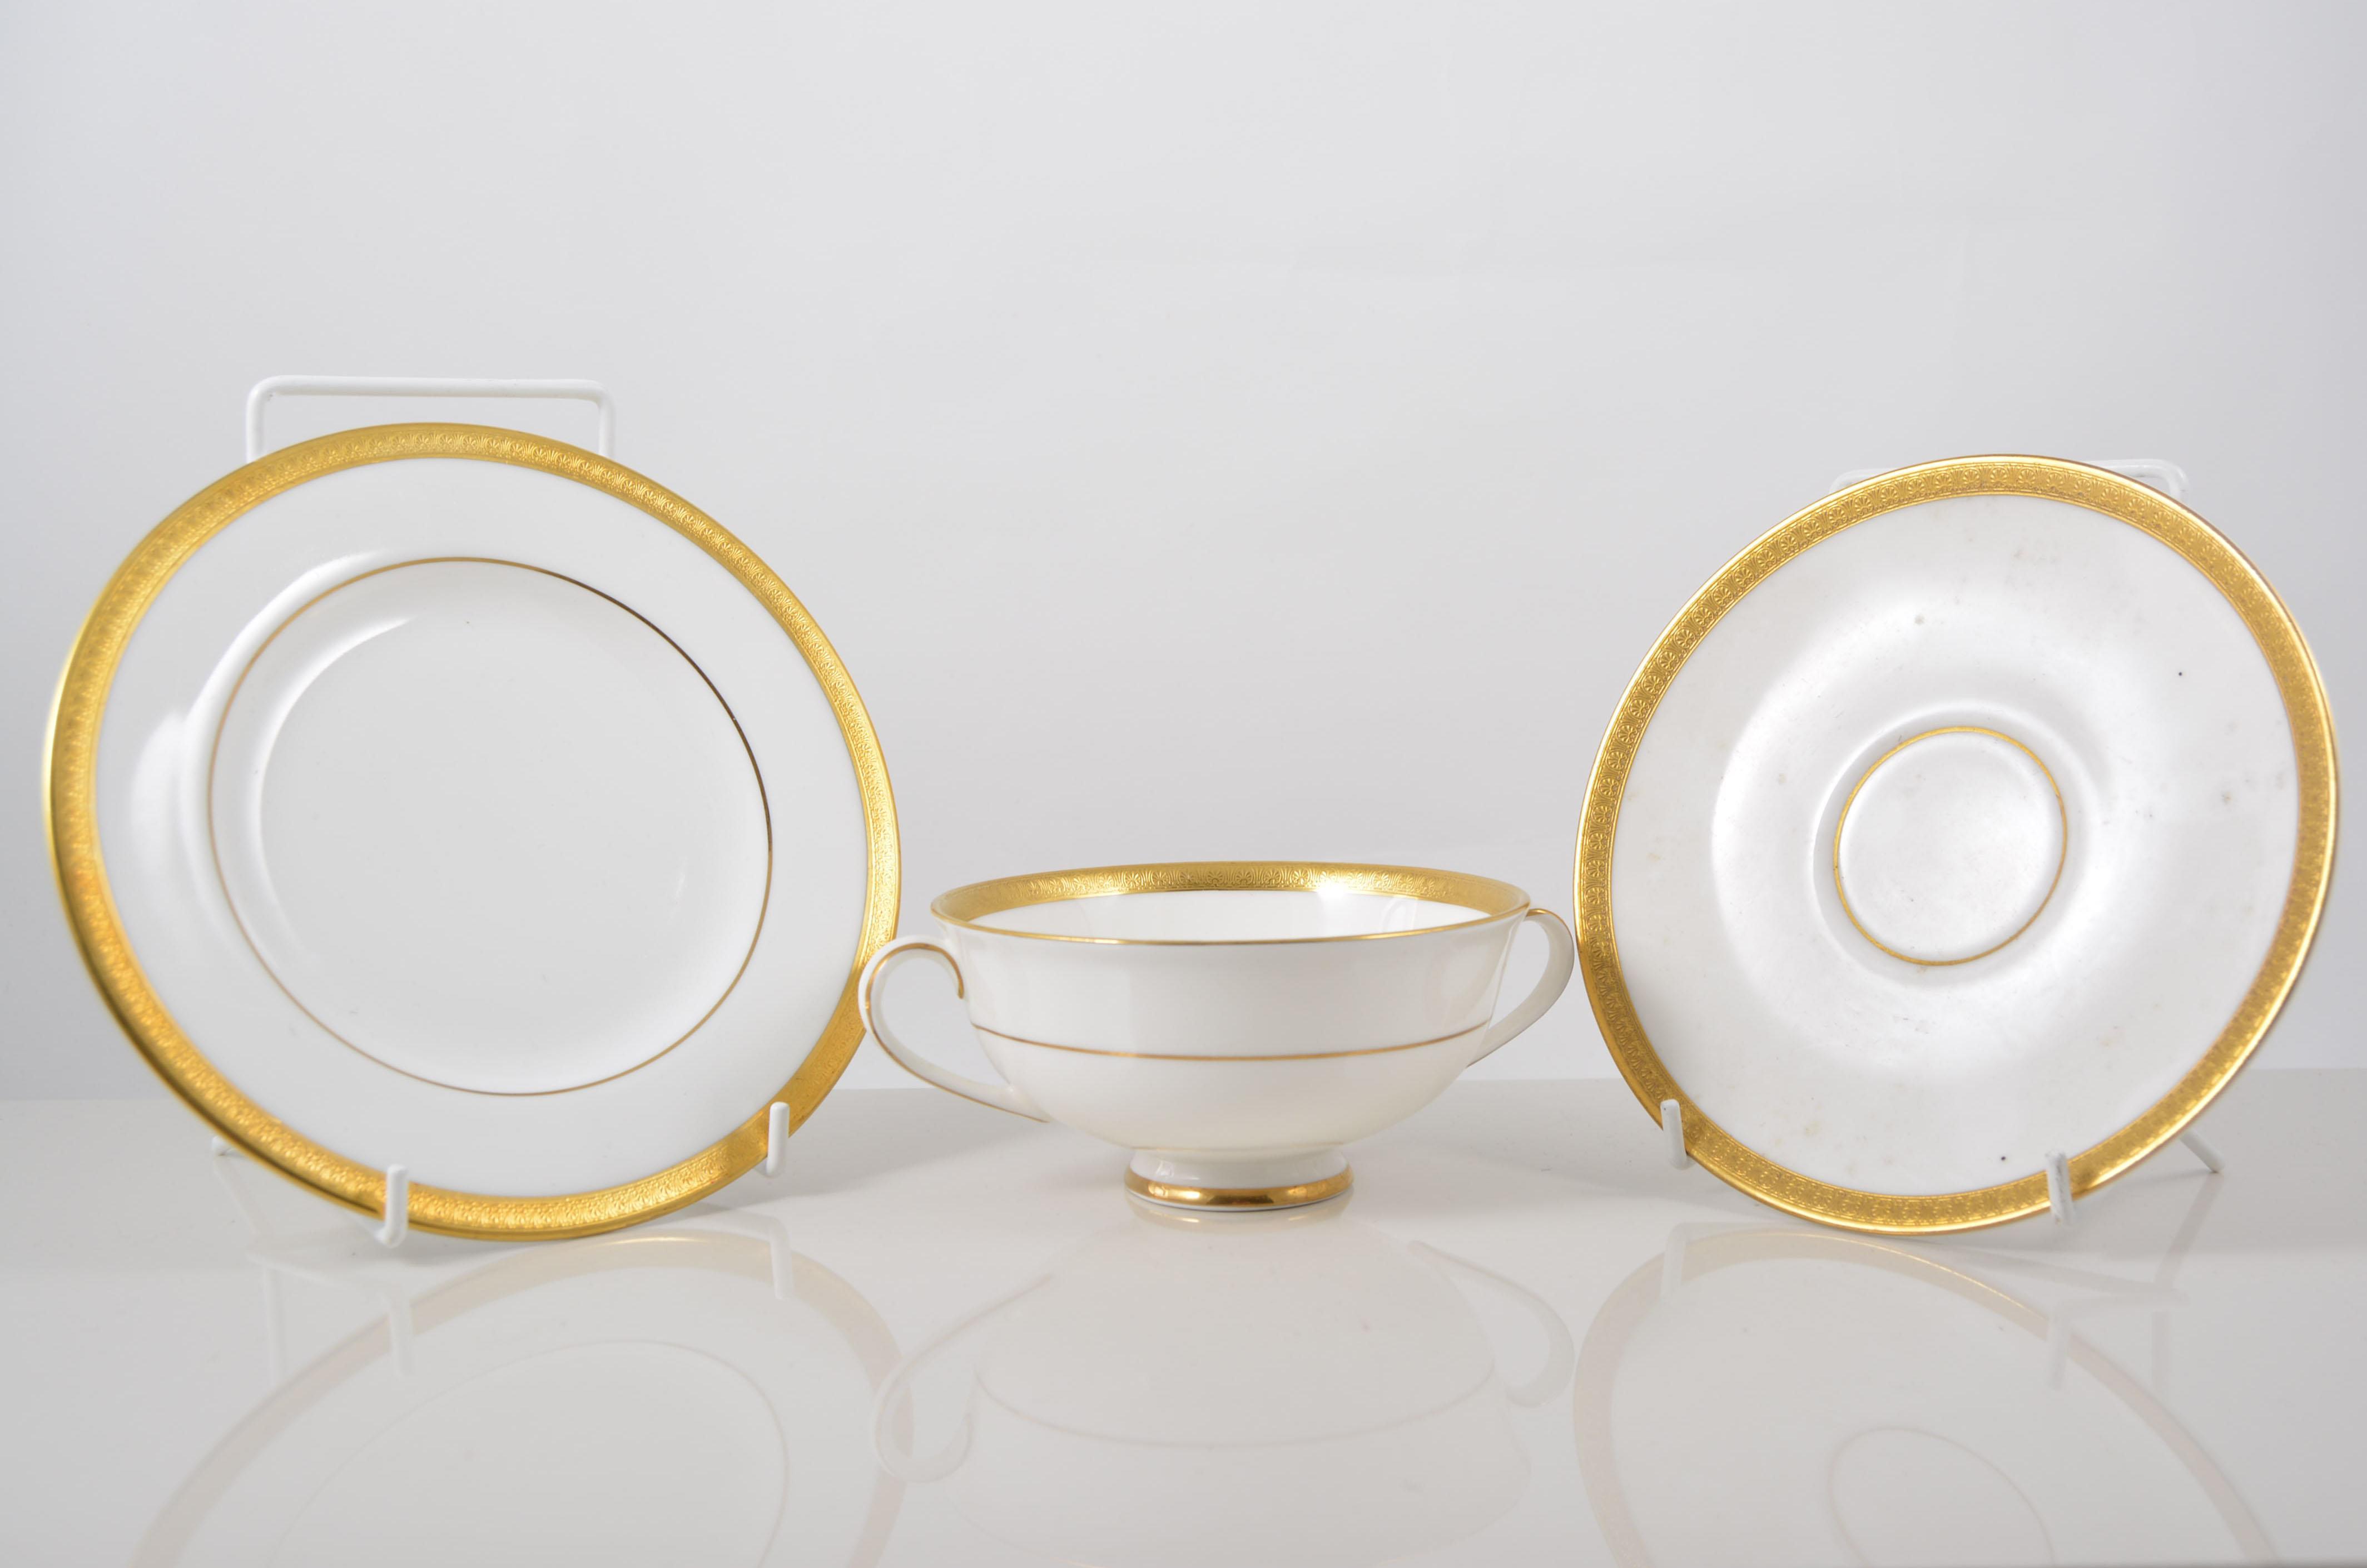 Lot 26 - Royal Doulton \ Royal Gold\  H4980 dinner service and Royal Worcester & Royal Doulton \